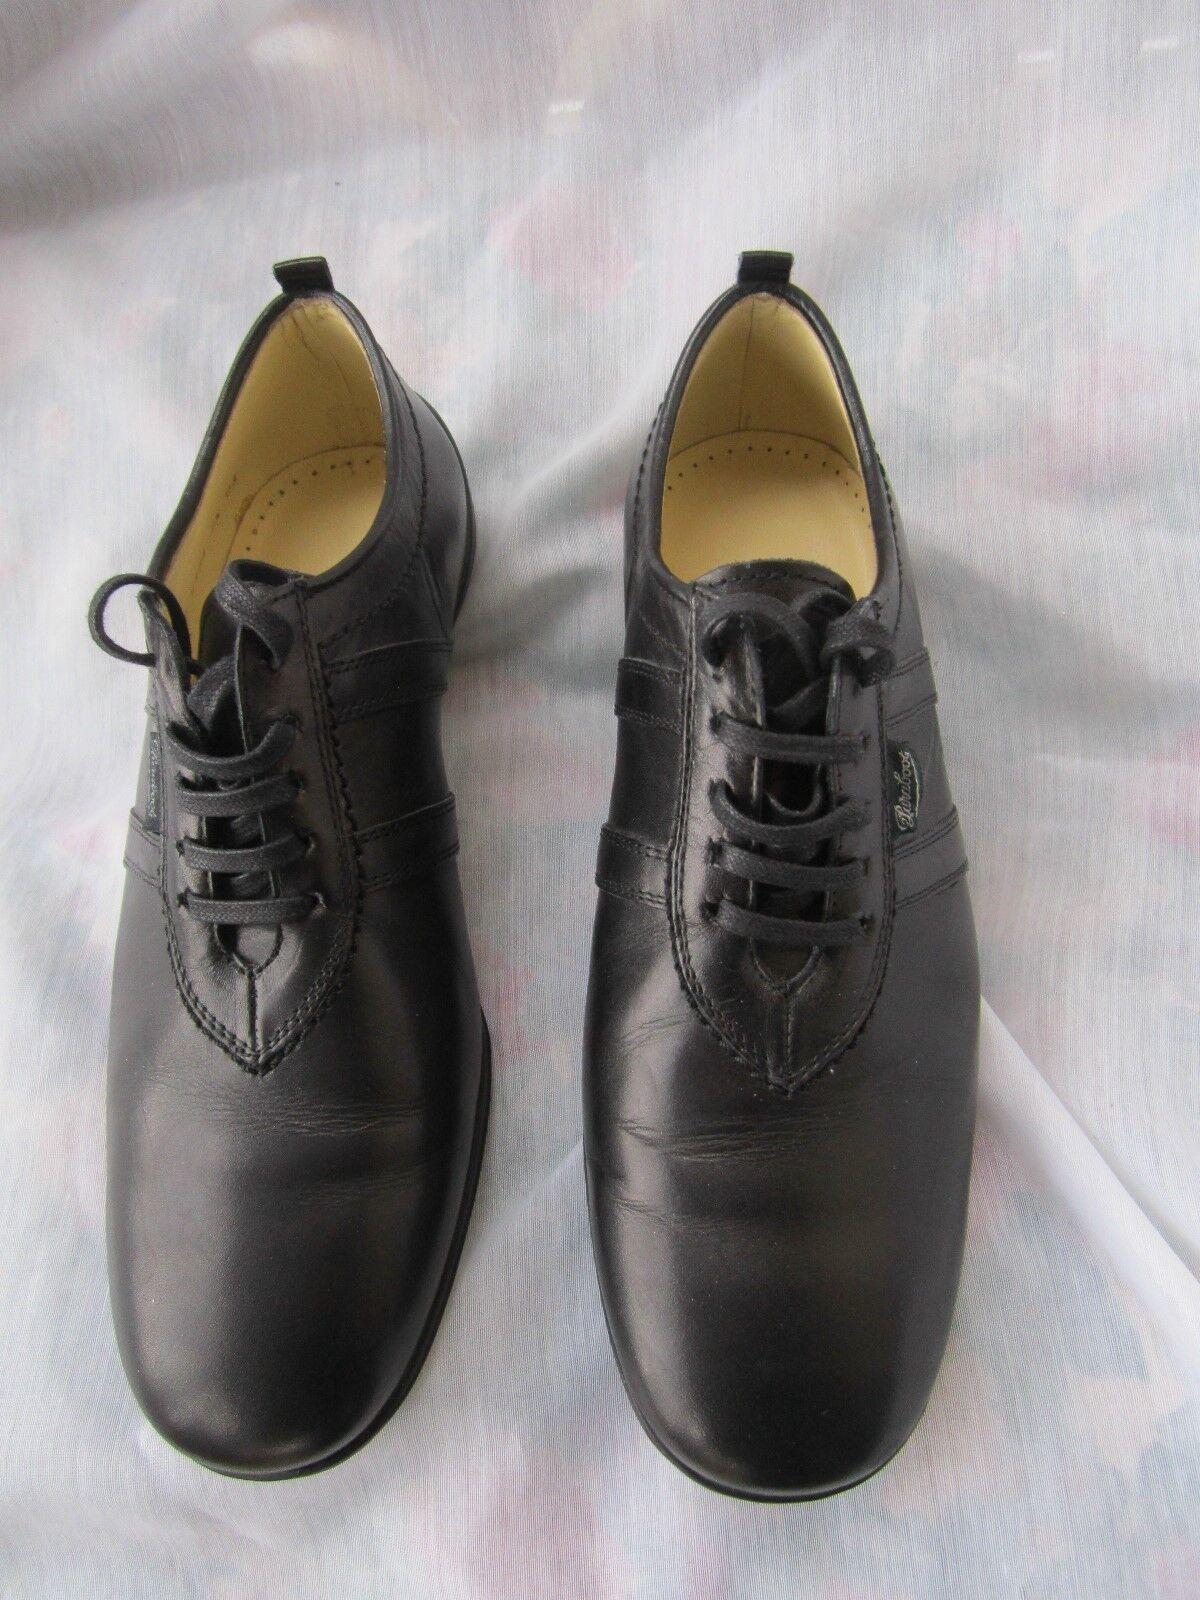 Paraboot Lace shoes Cousu Blake Size UK 3.5 USA 6 Richard Pontgreen France